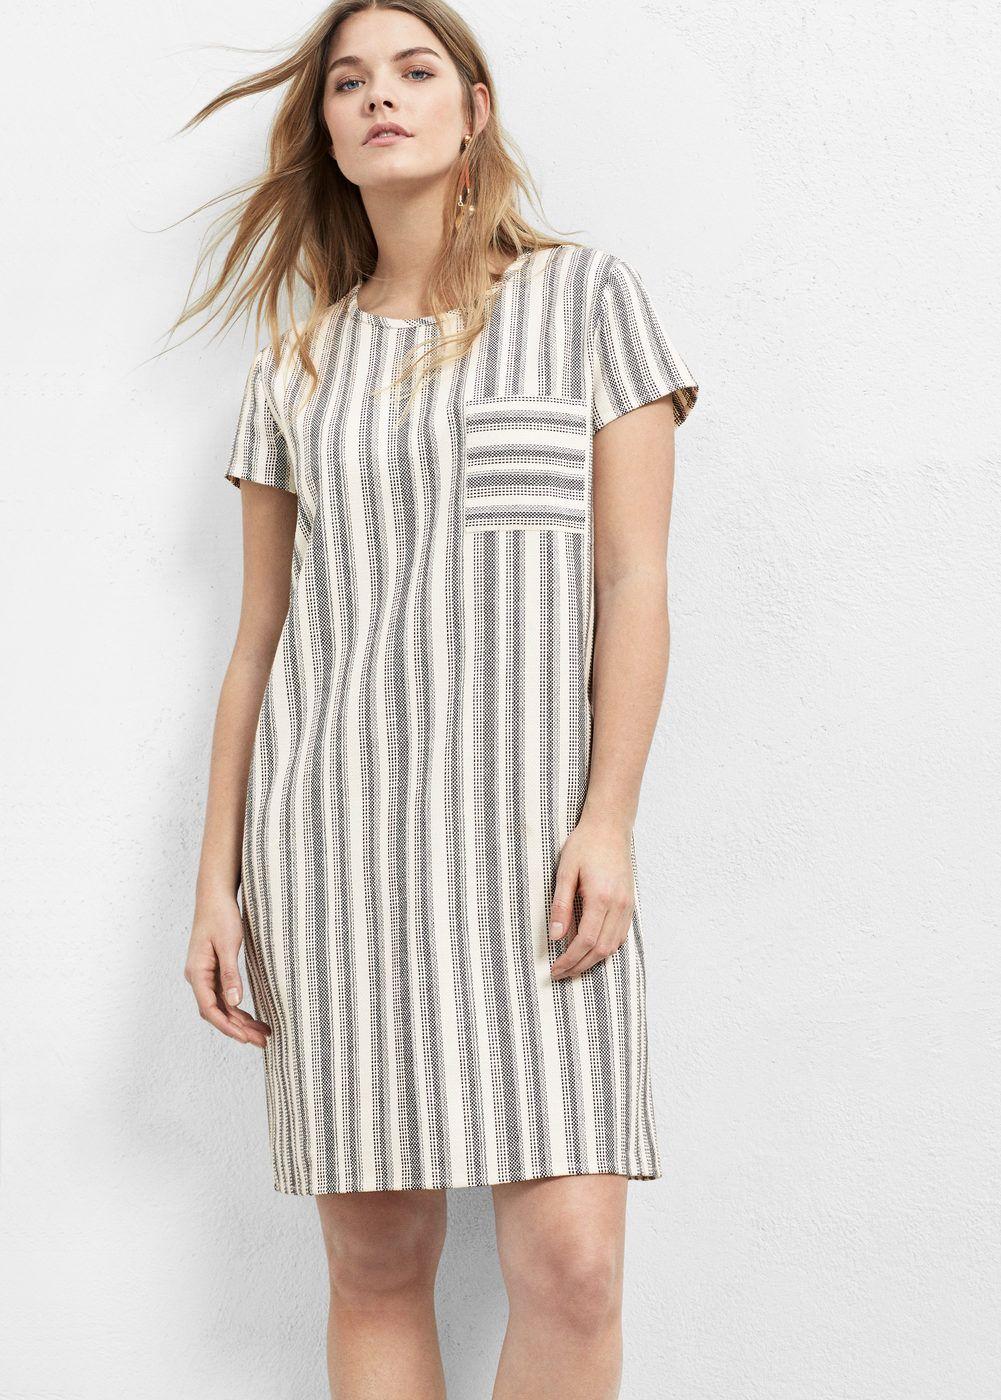 striped cotton dress - plus sizes | violetamango usa